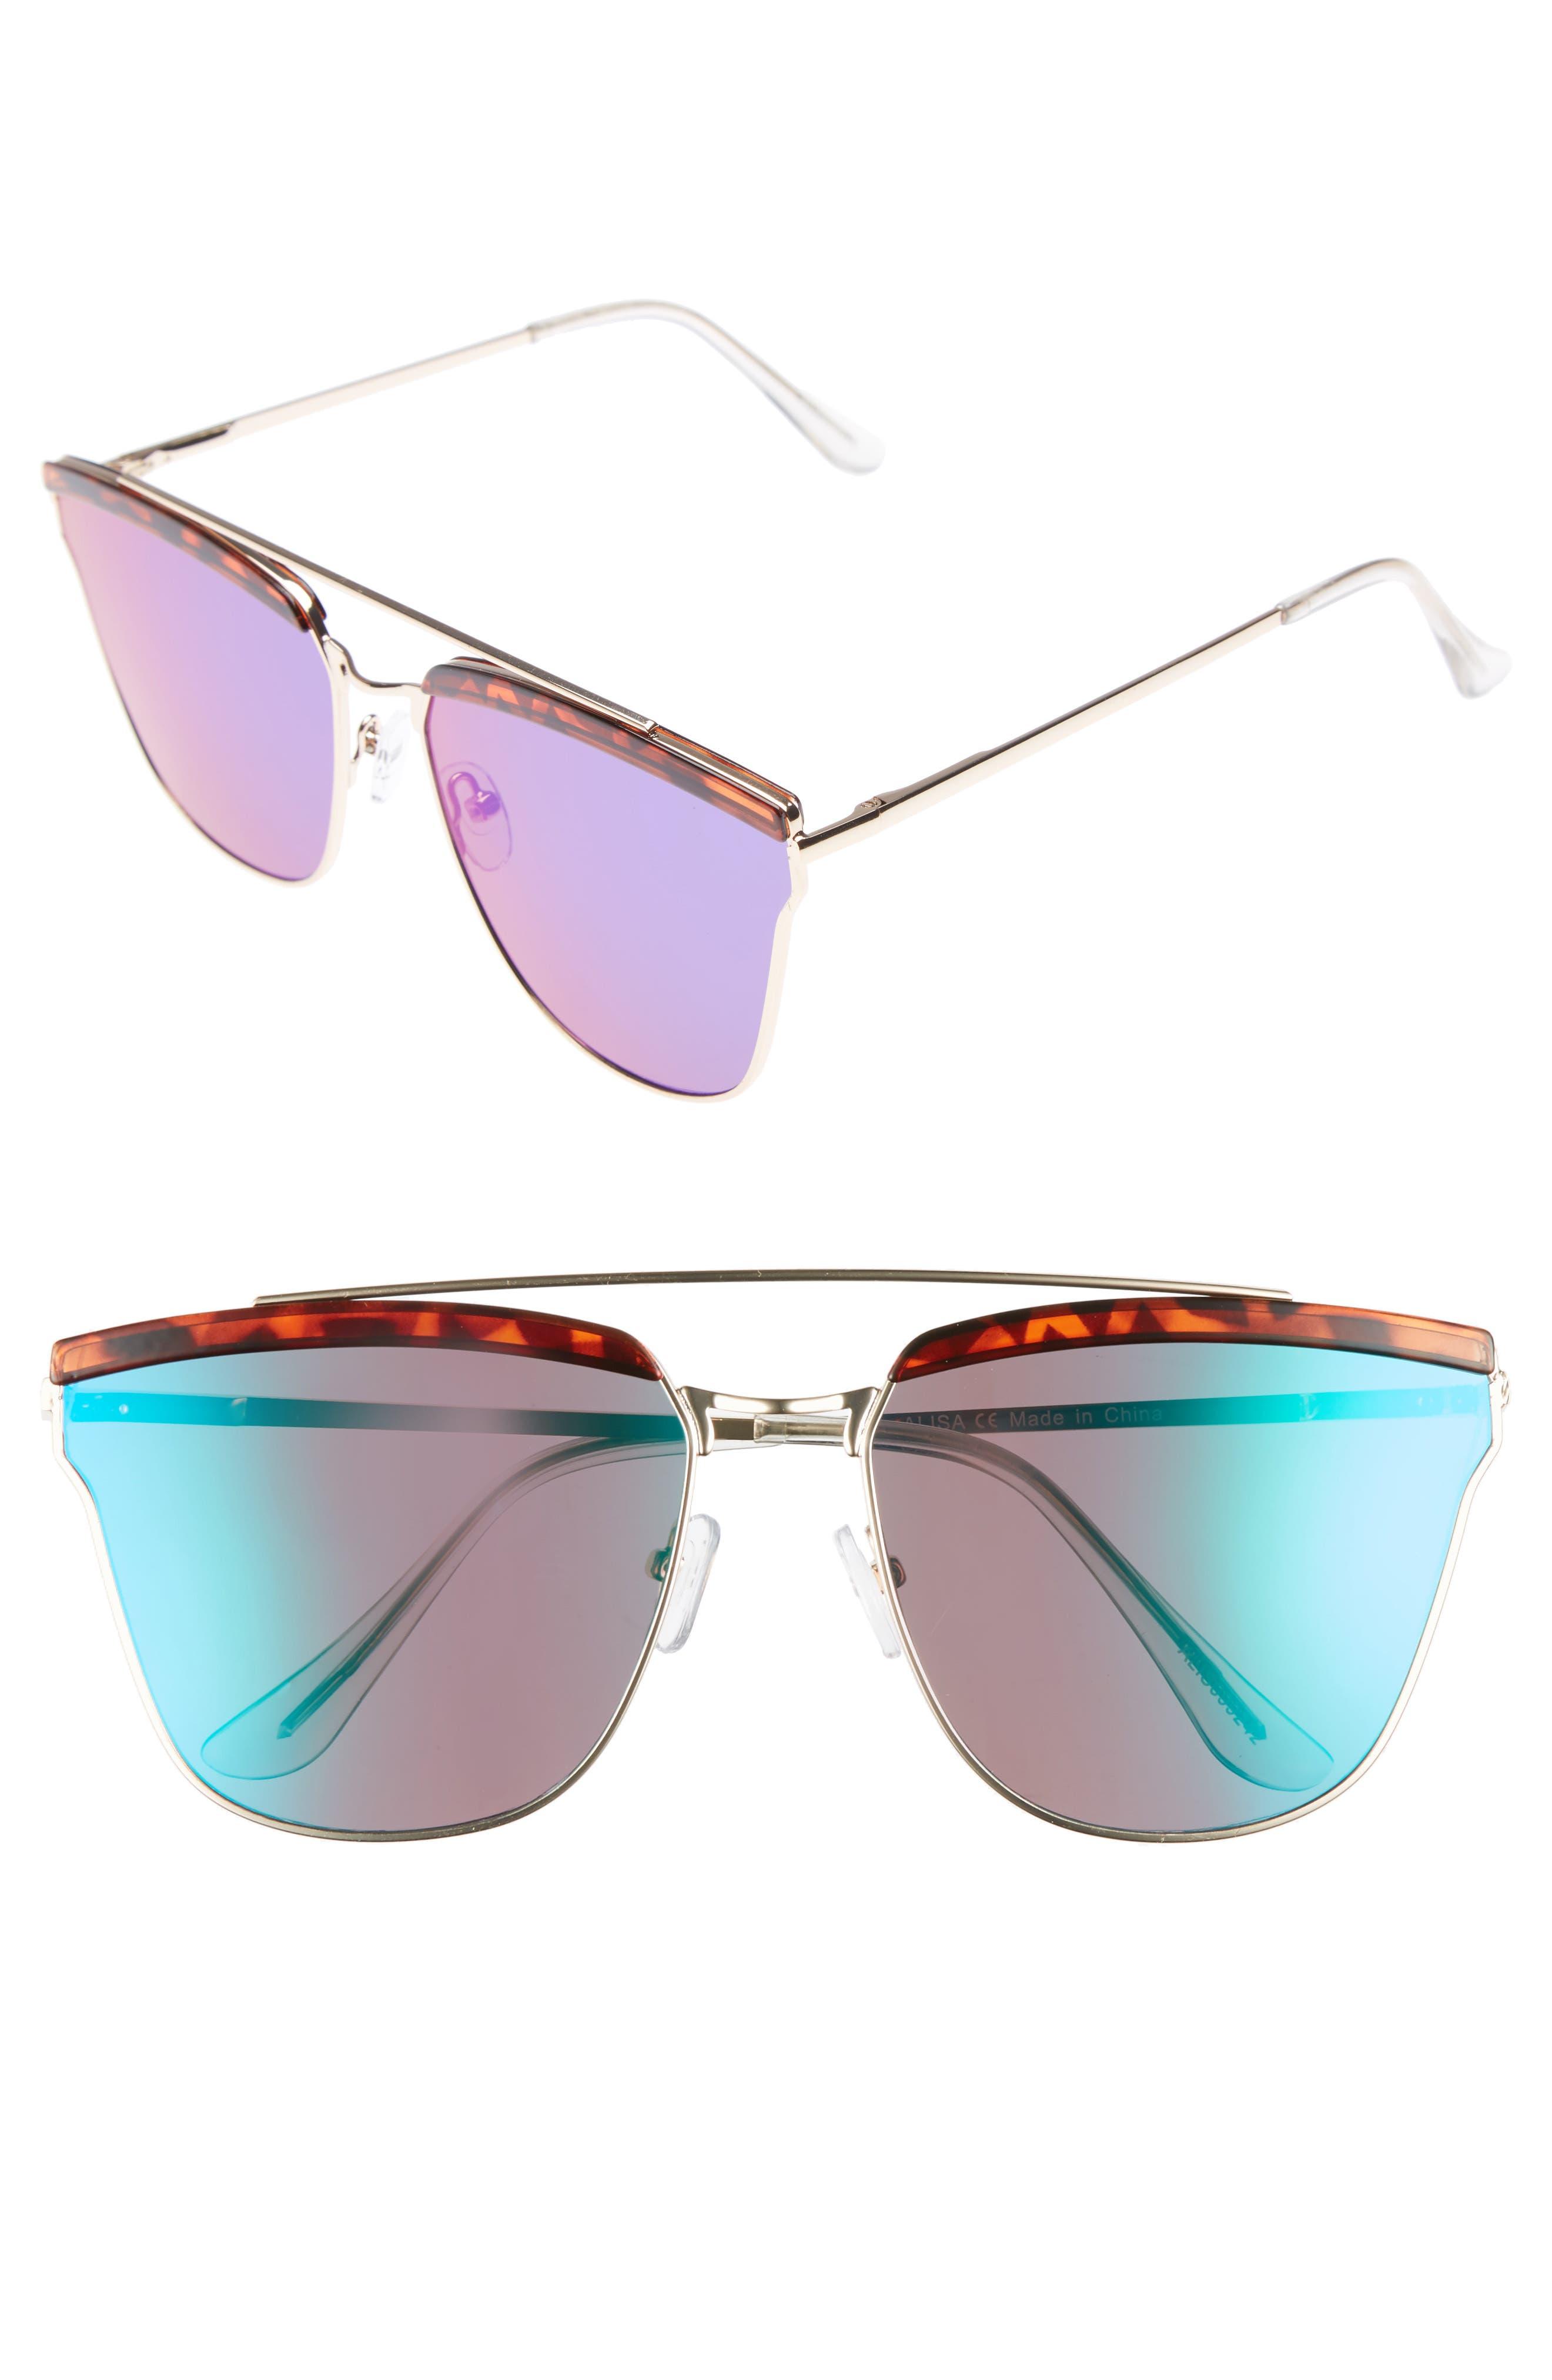 60mm Mirror Sunglasses,                         Main,                         color, Gold/ Tort